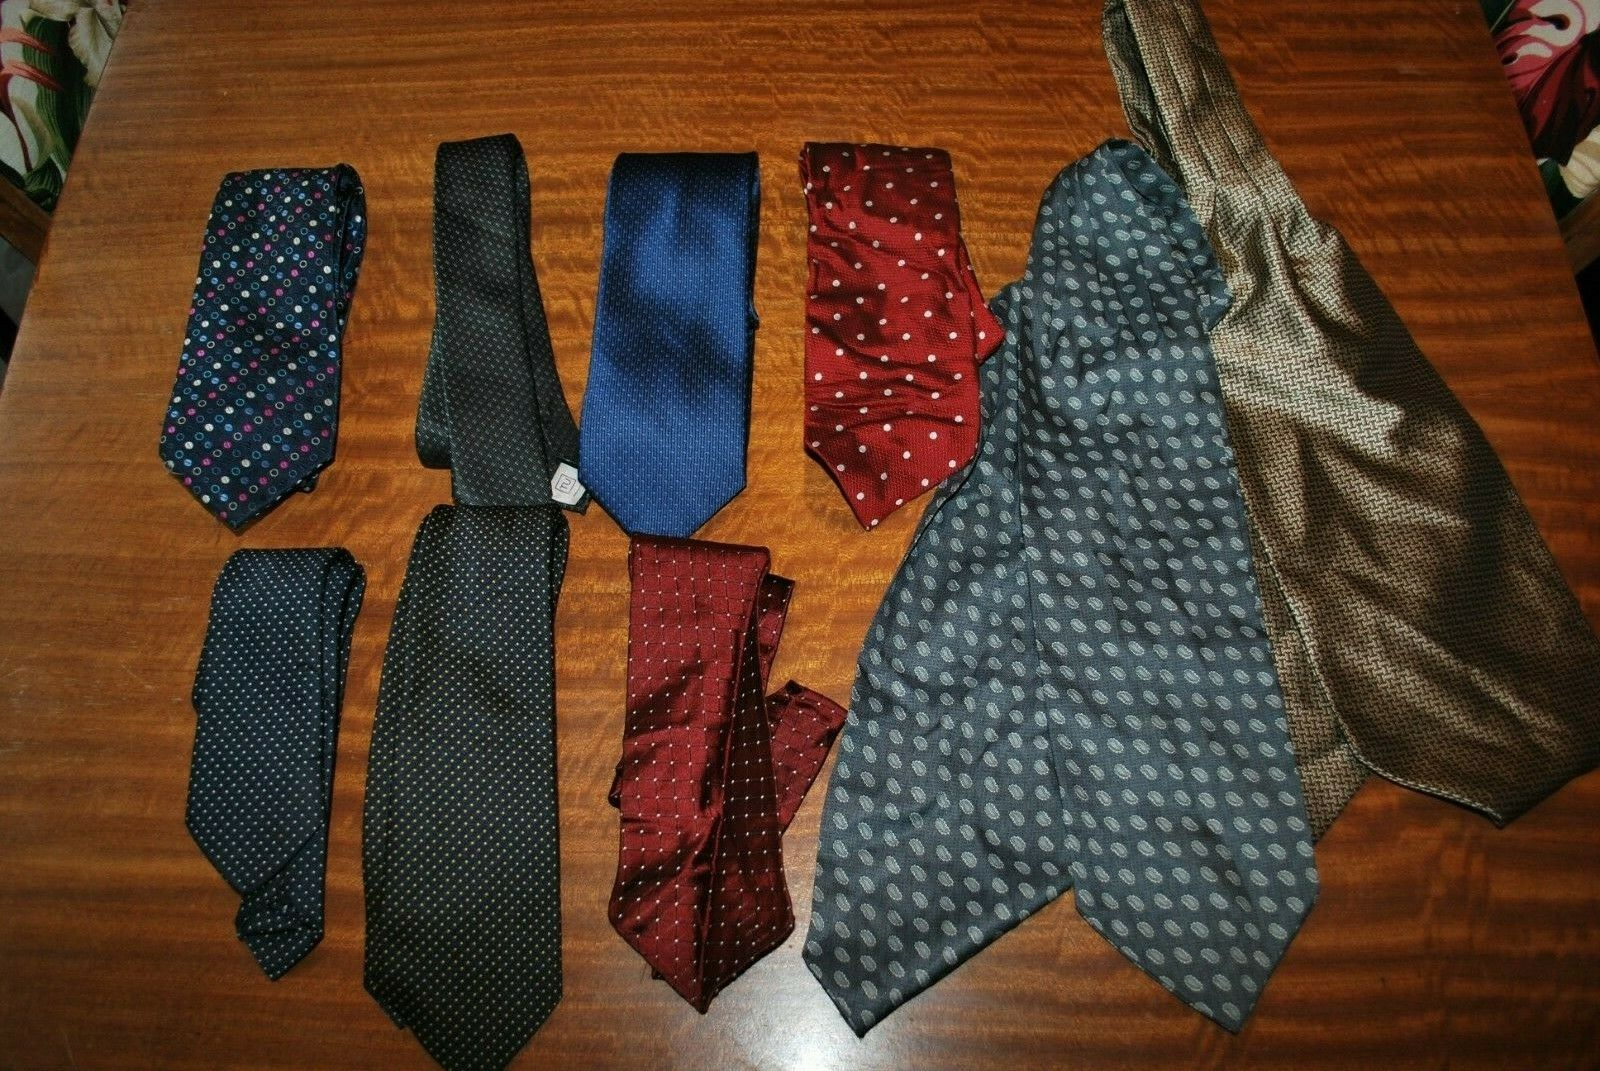 7 x spotted Tie's & 2 Cravat's job lot bulk buy 5